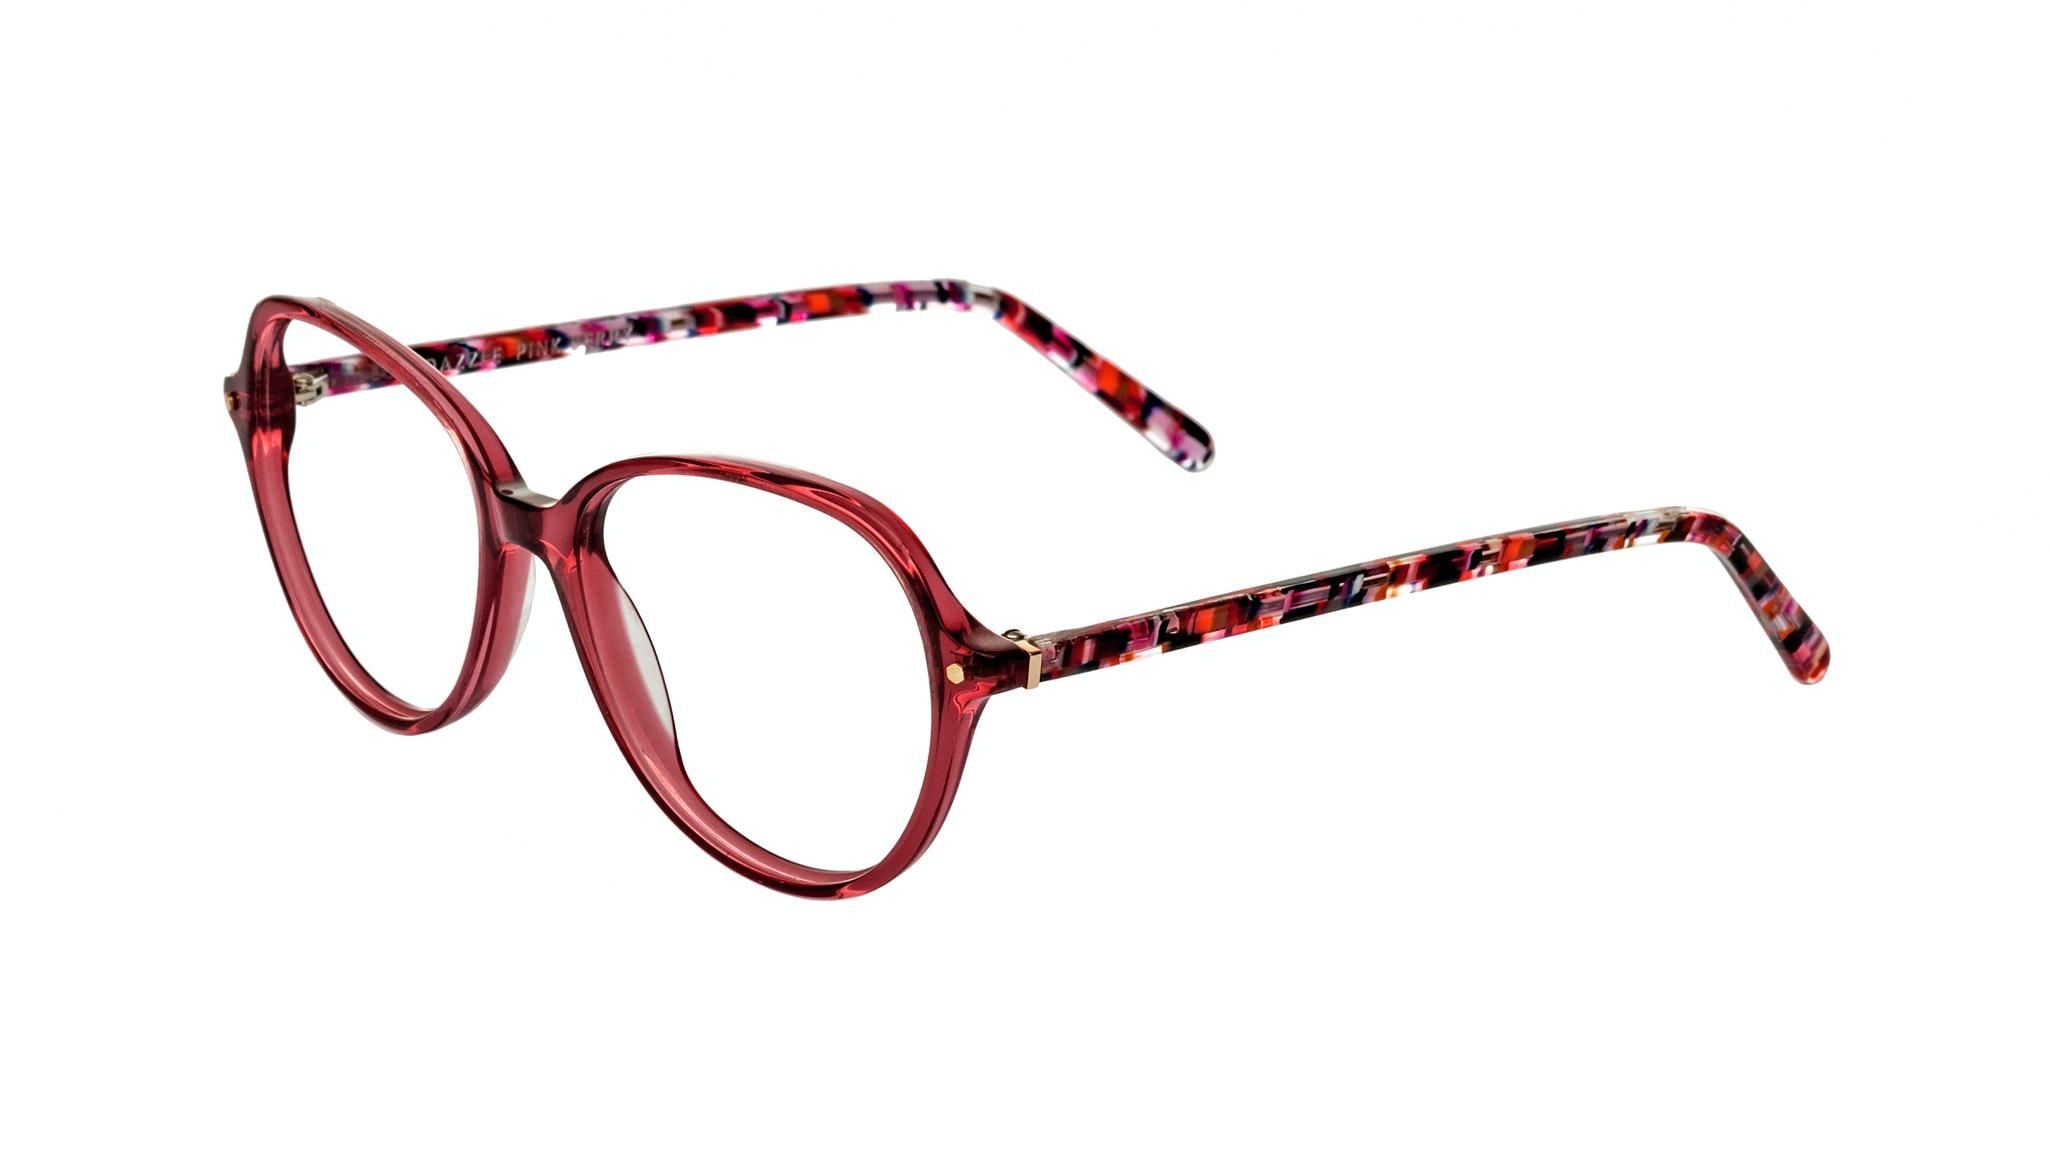 Affordable Fashion Glasses Round Eyeglasses Women Dazzle pink-berry Tilt